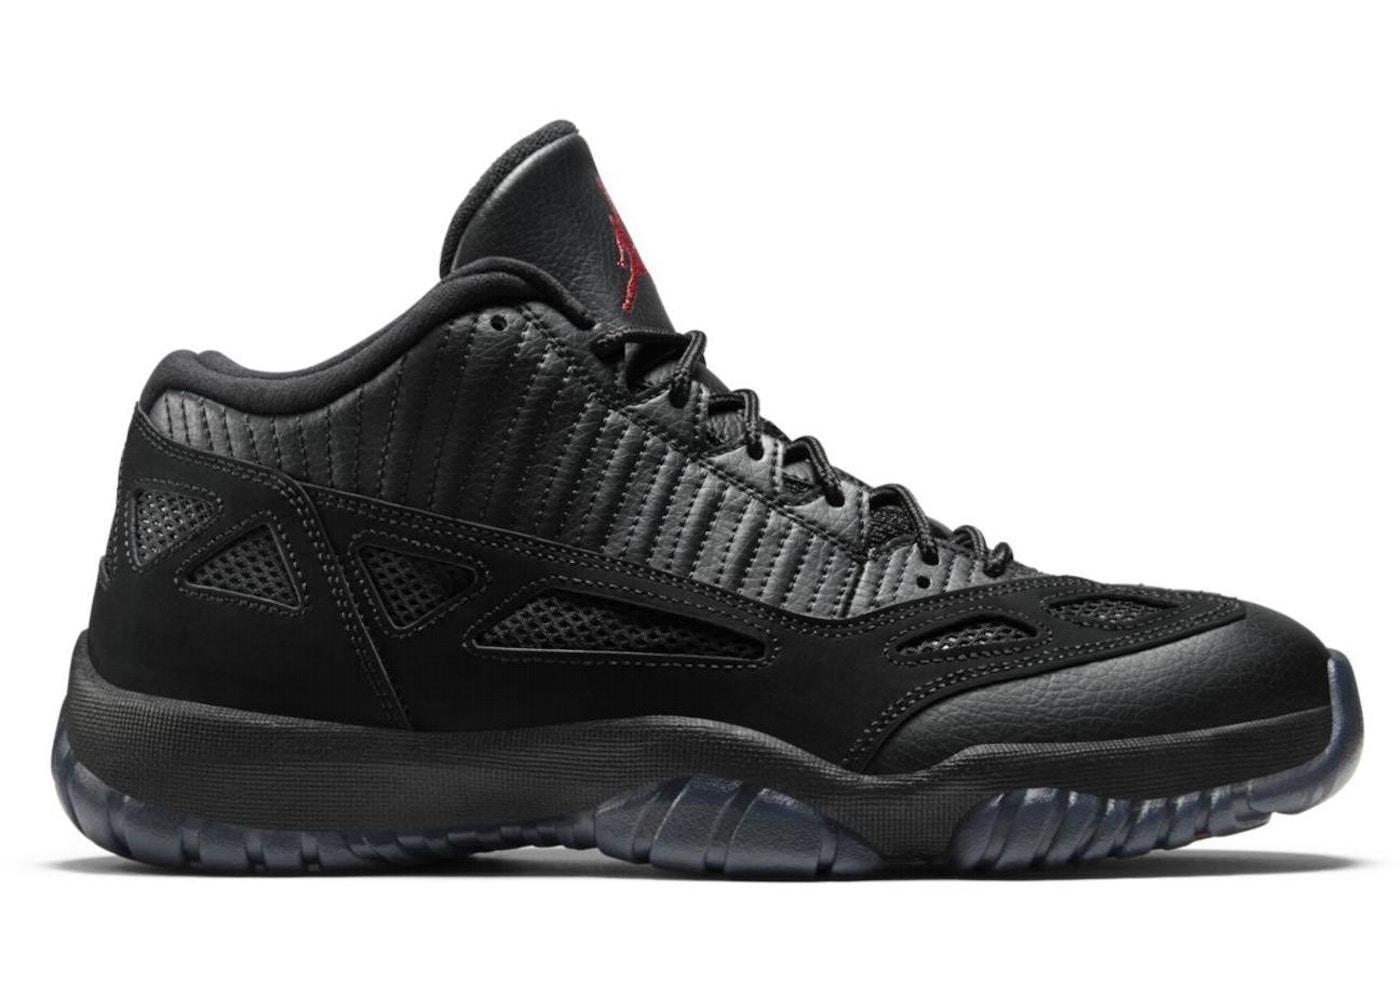 79b92d5a6816bb Buy Air Jordan 11 Size 16 Shoes   Deadstock Sneakers